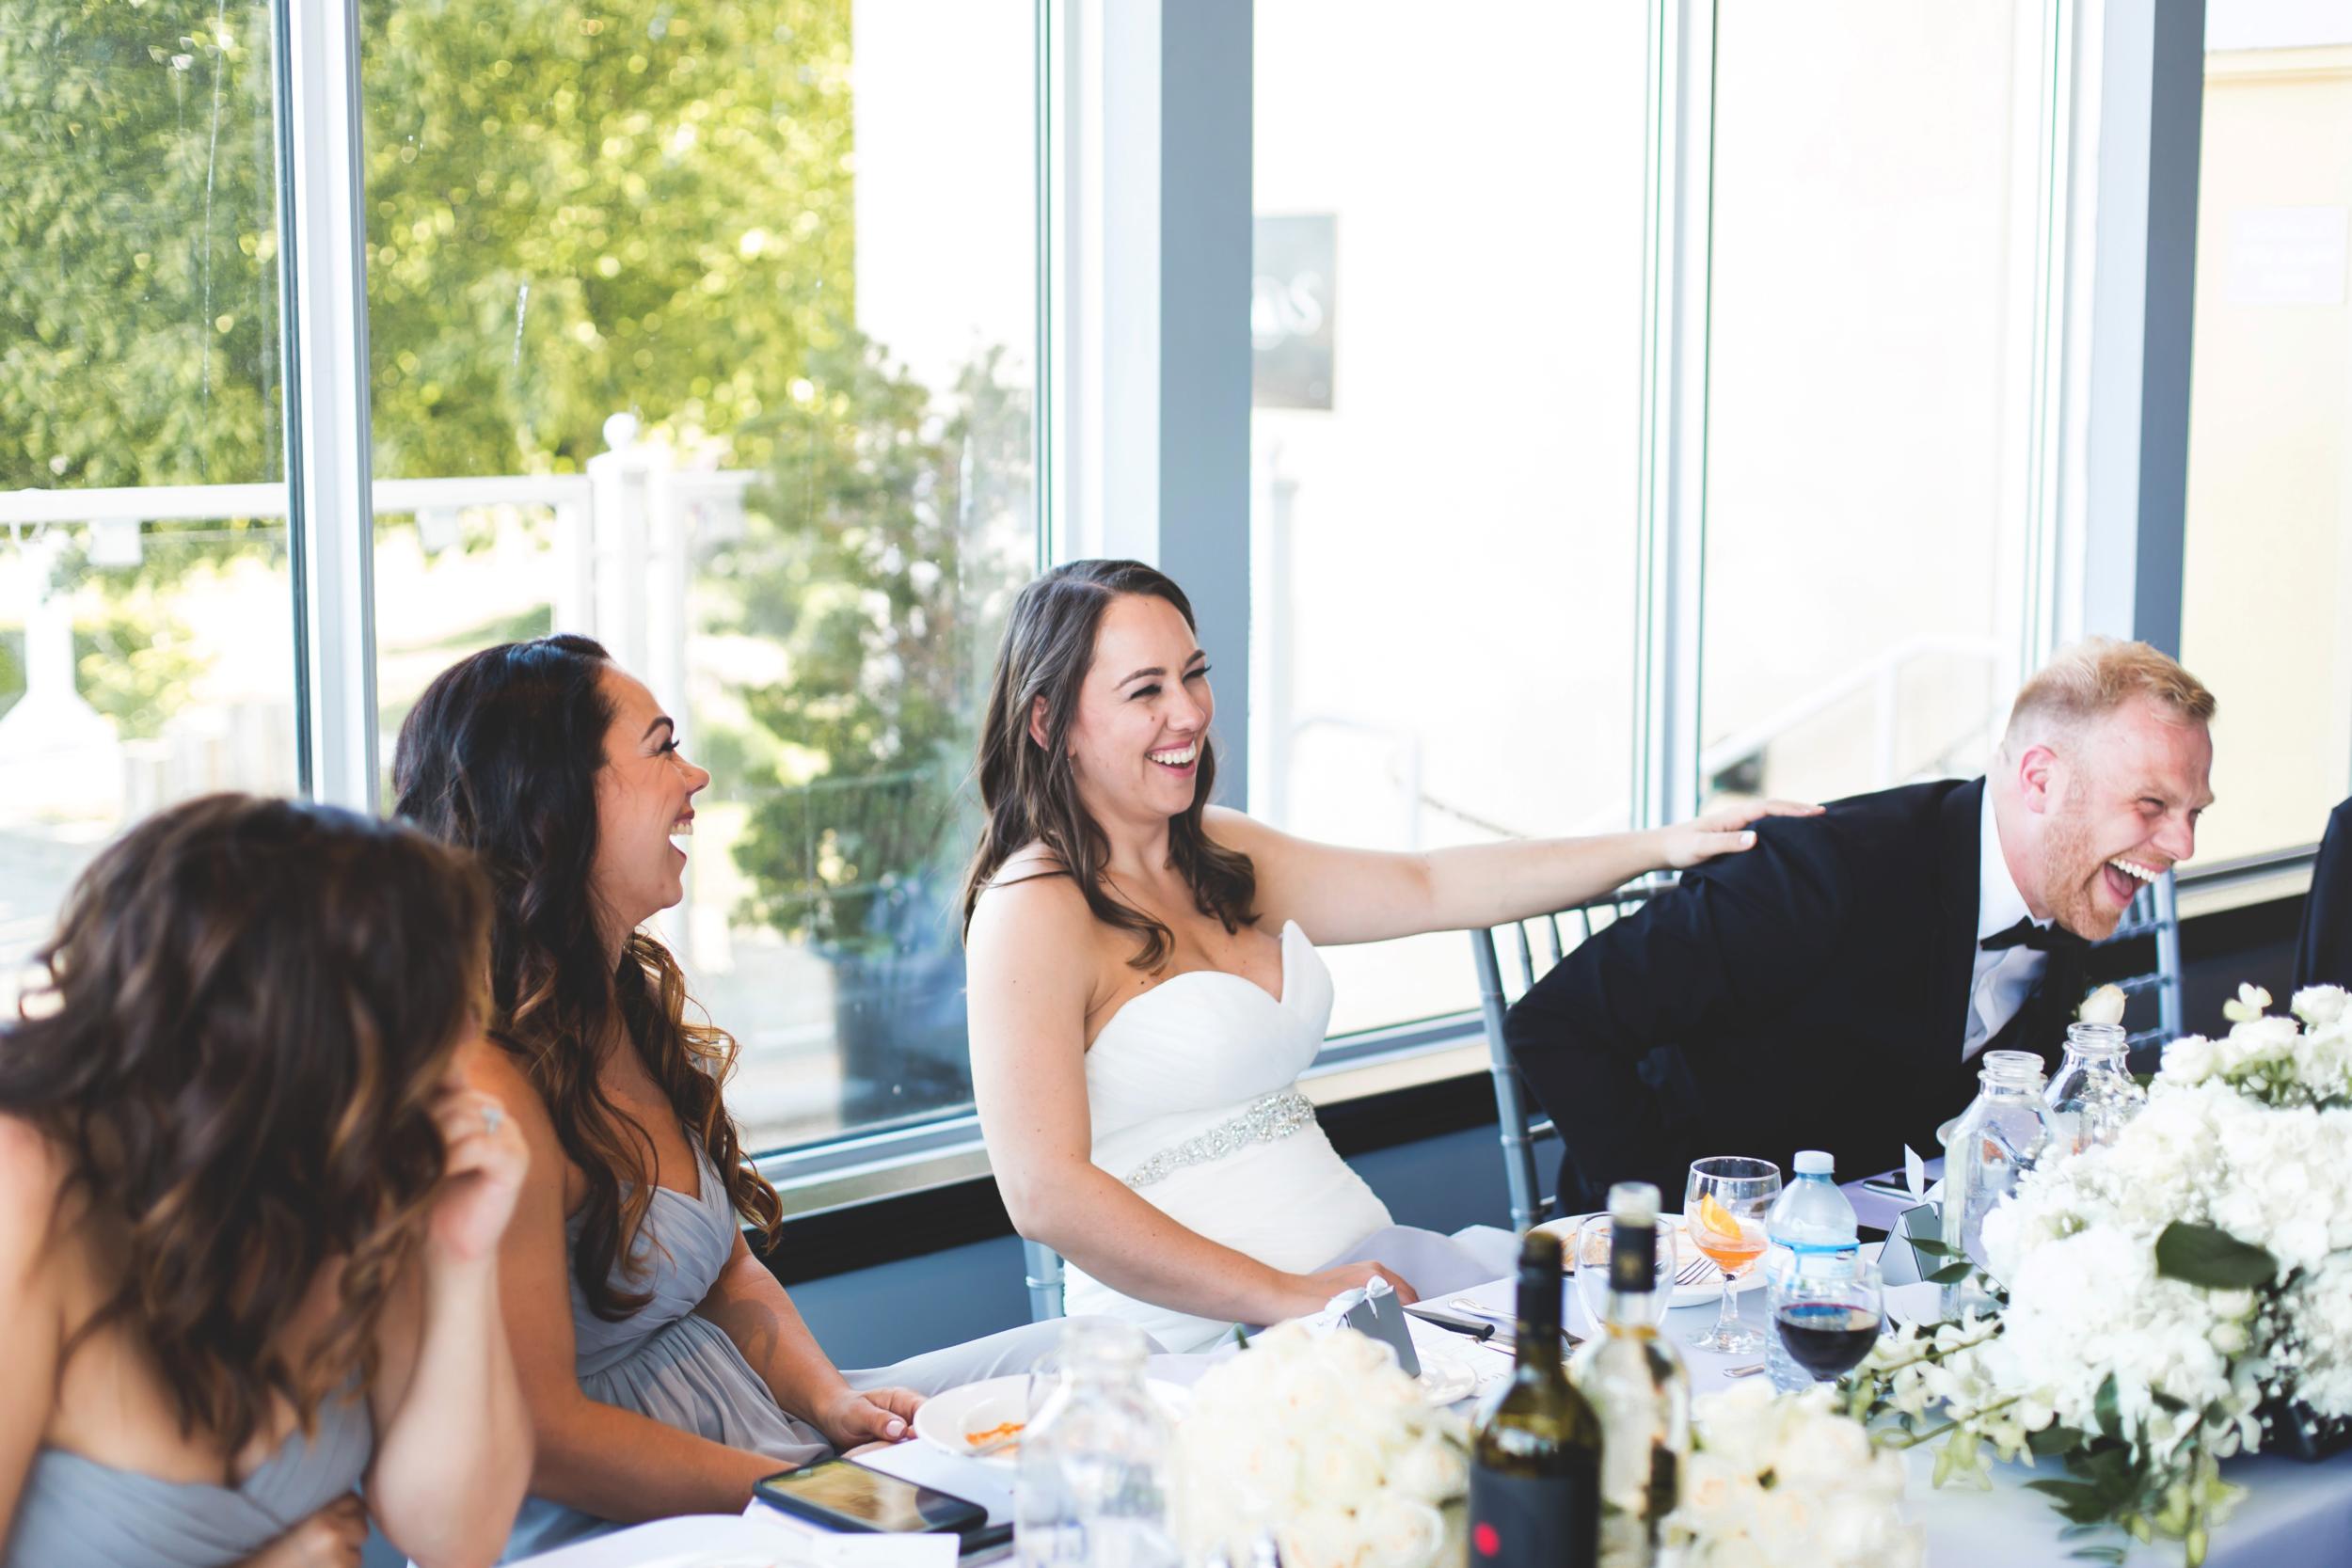 Wedding-Harbour-Banquet-Center-Oakville-Photographer-Wedding-Hamilton-Saint-James-Espresso-Downtown-HamOnt-GTA-Niagara-Toronto-Moments-by-Lauren-Photography-Photo-Image-60.png